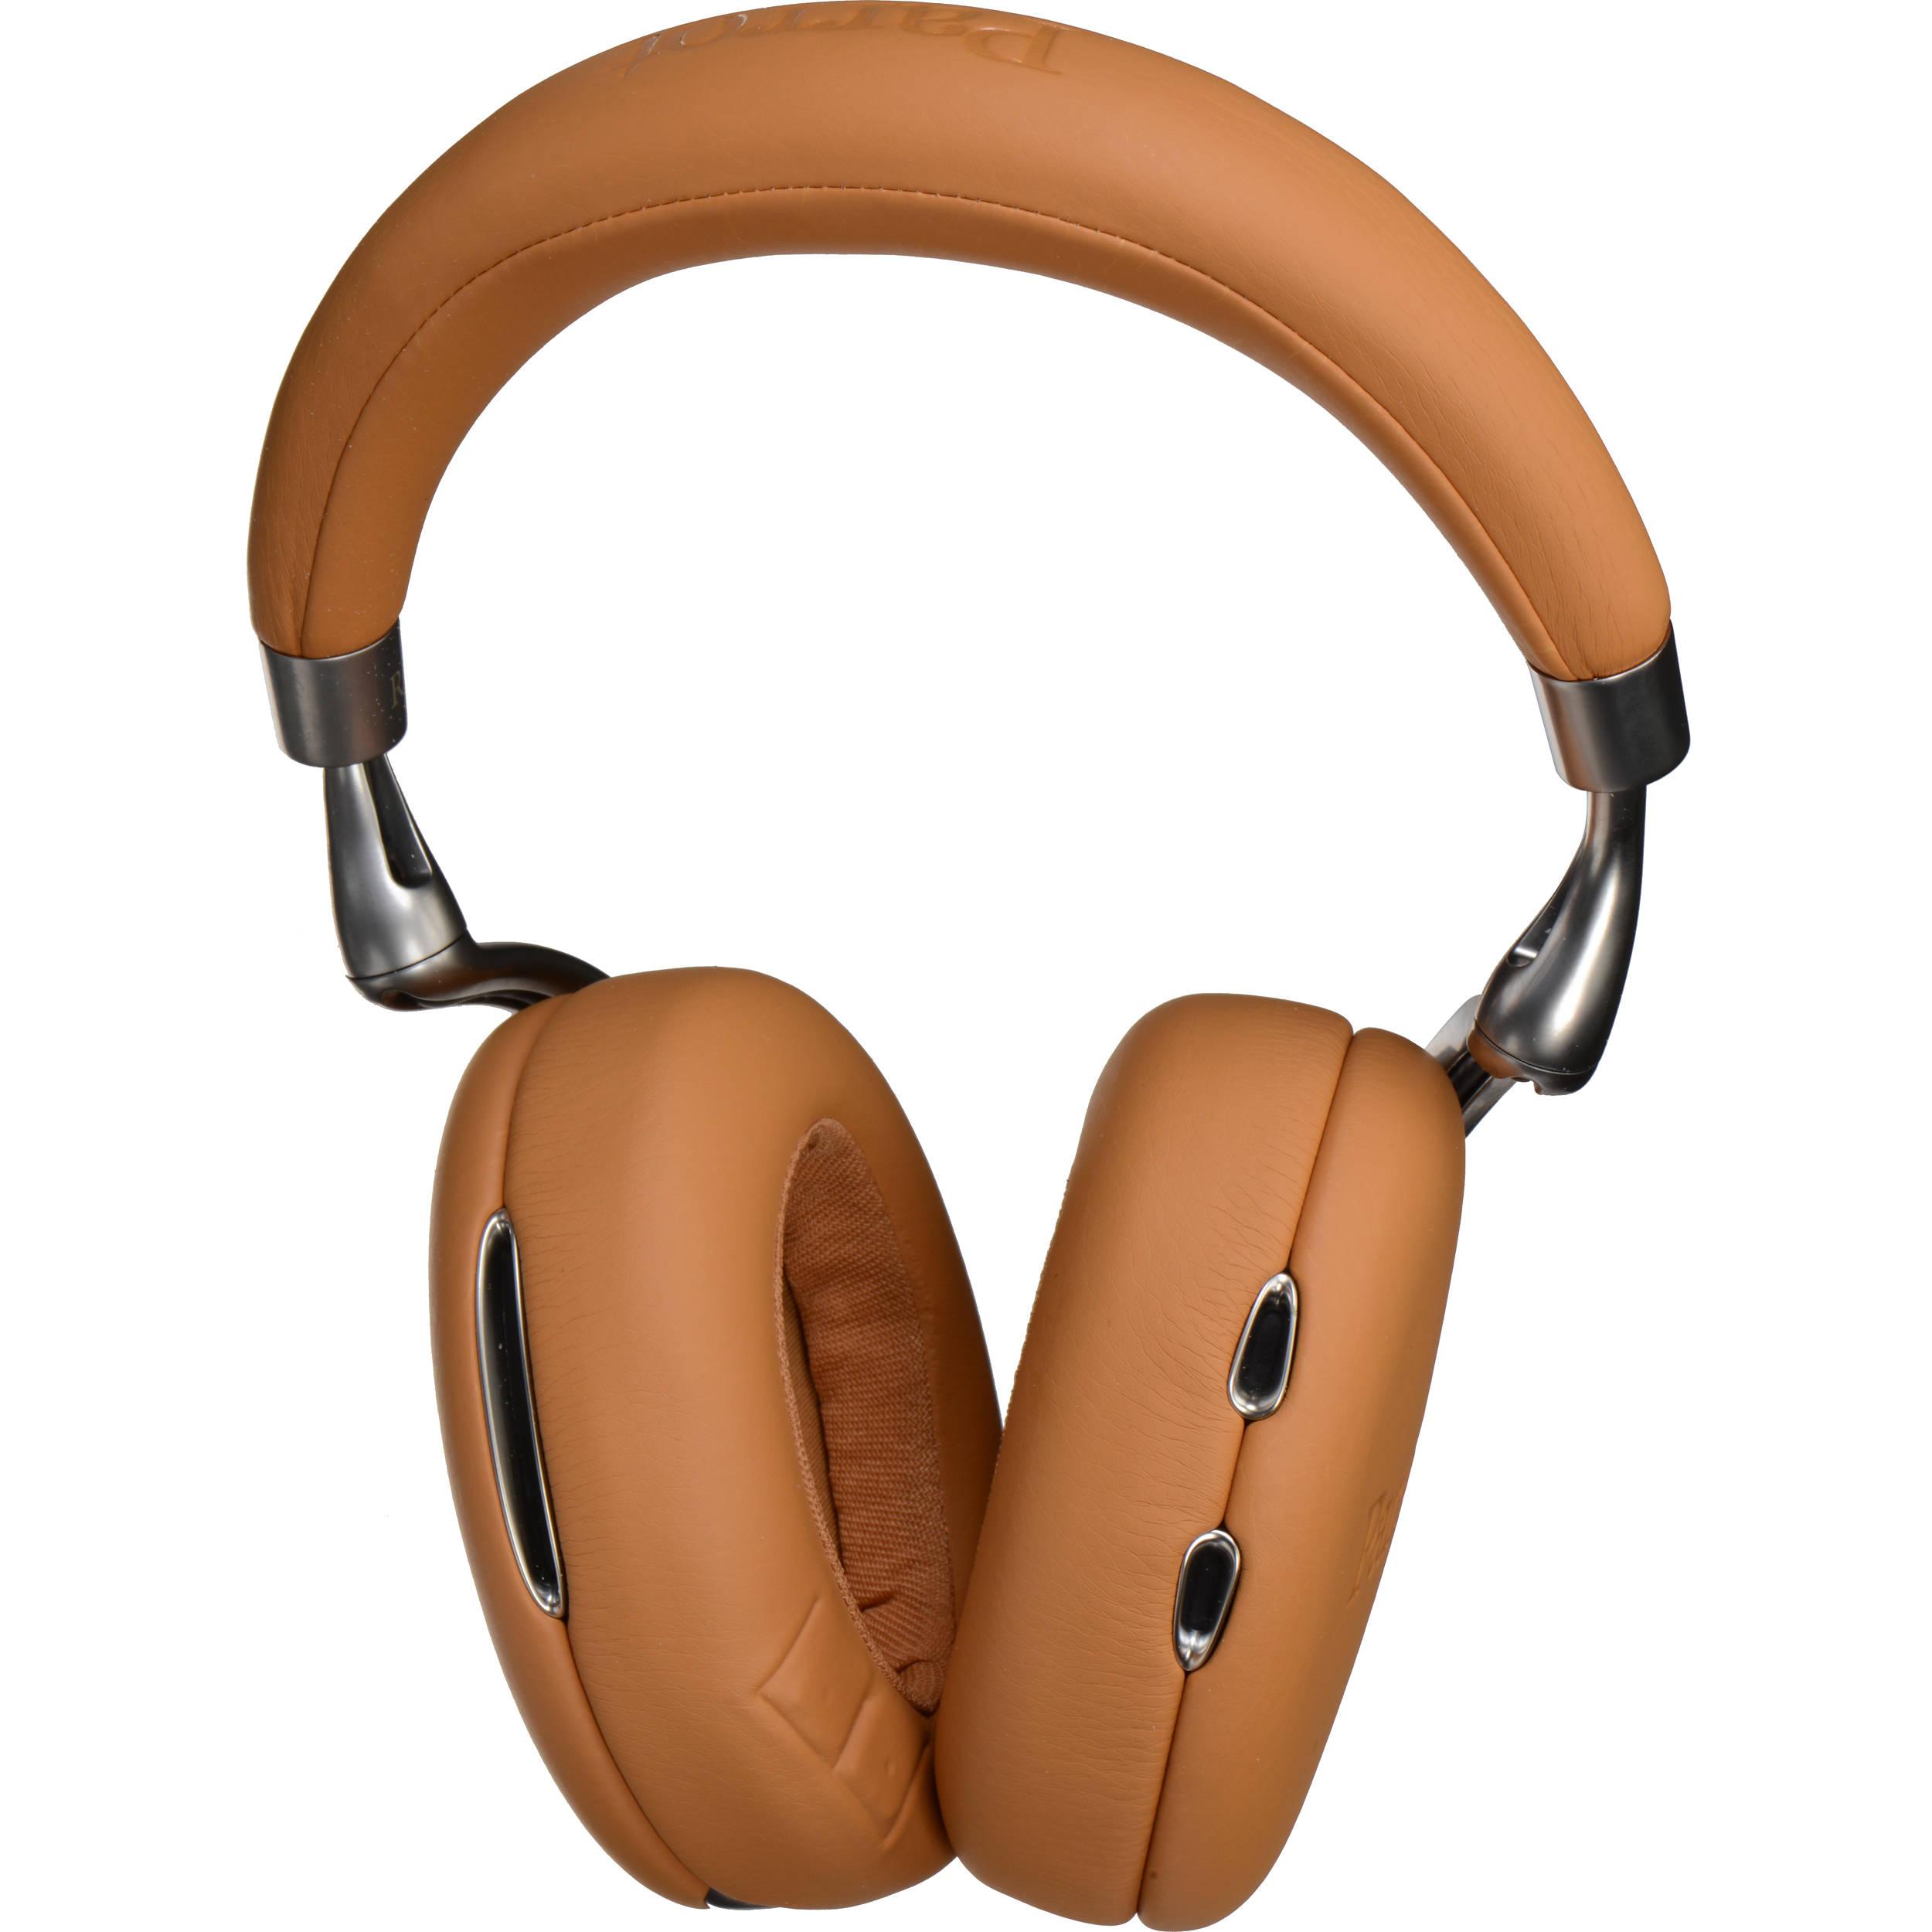 Parrot Zik 3.0 Stereo Bluetooth Headphones PF562007 B&H Photo